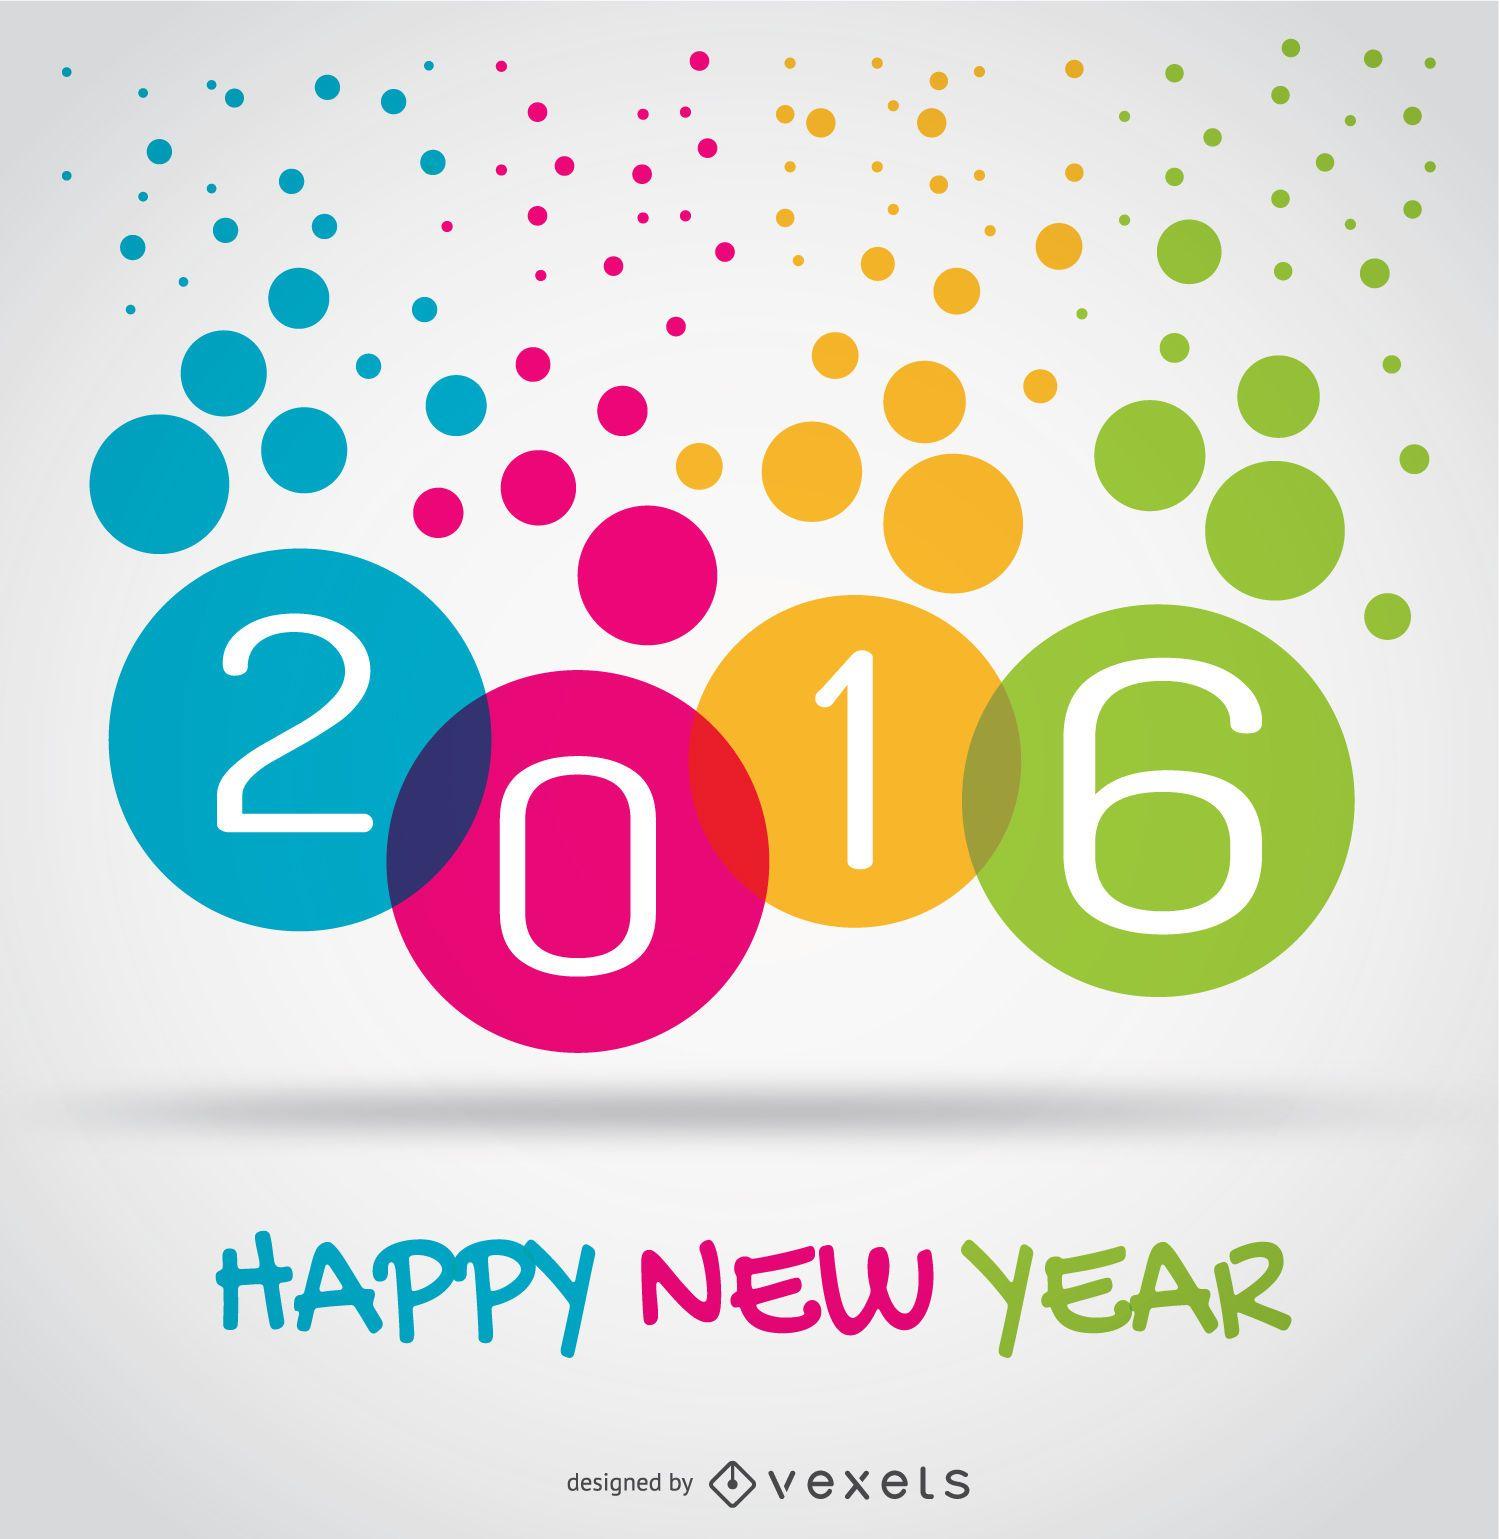 Colorful 2016 new year circles